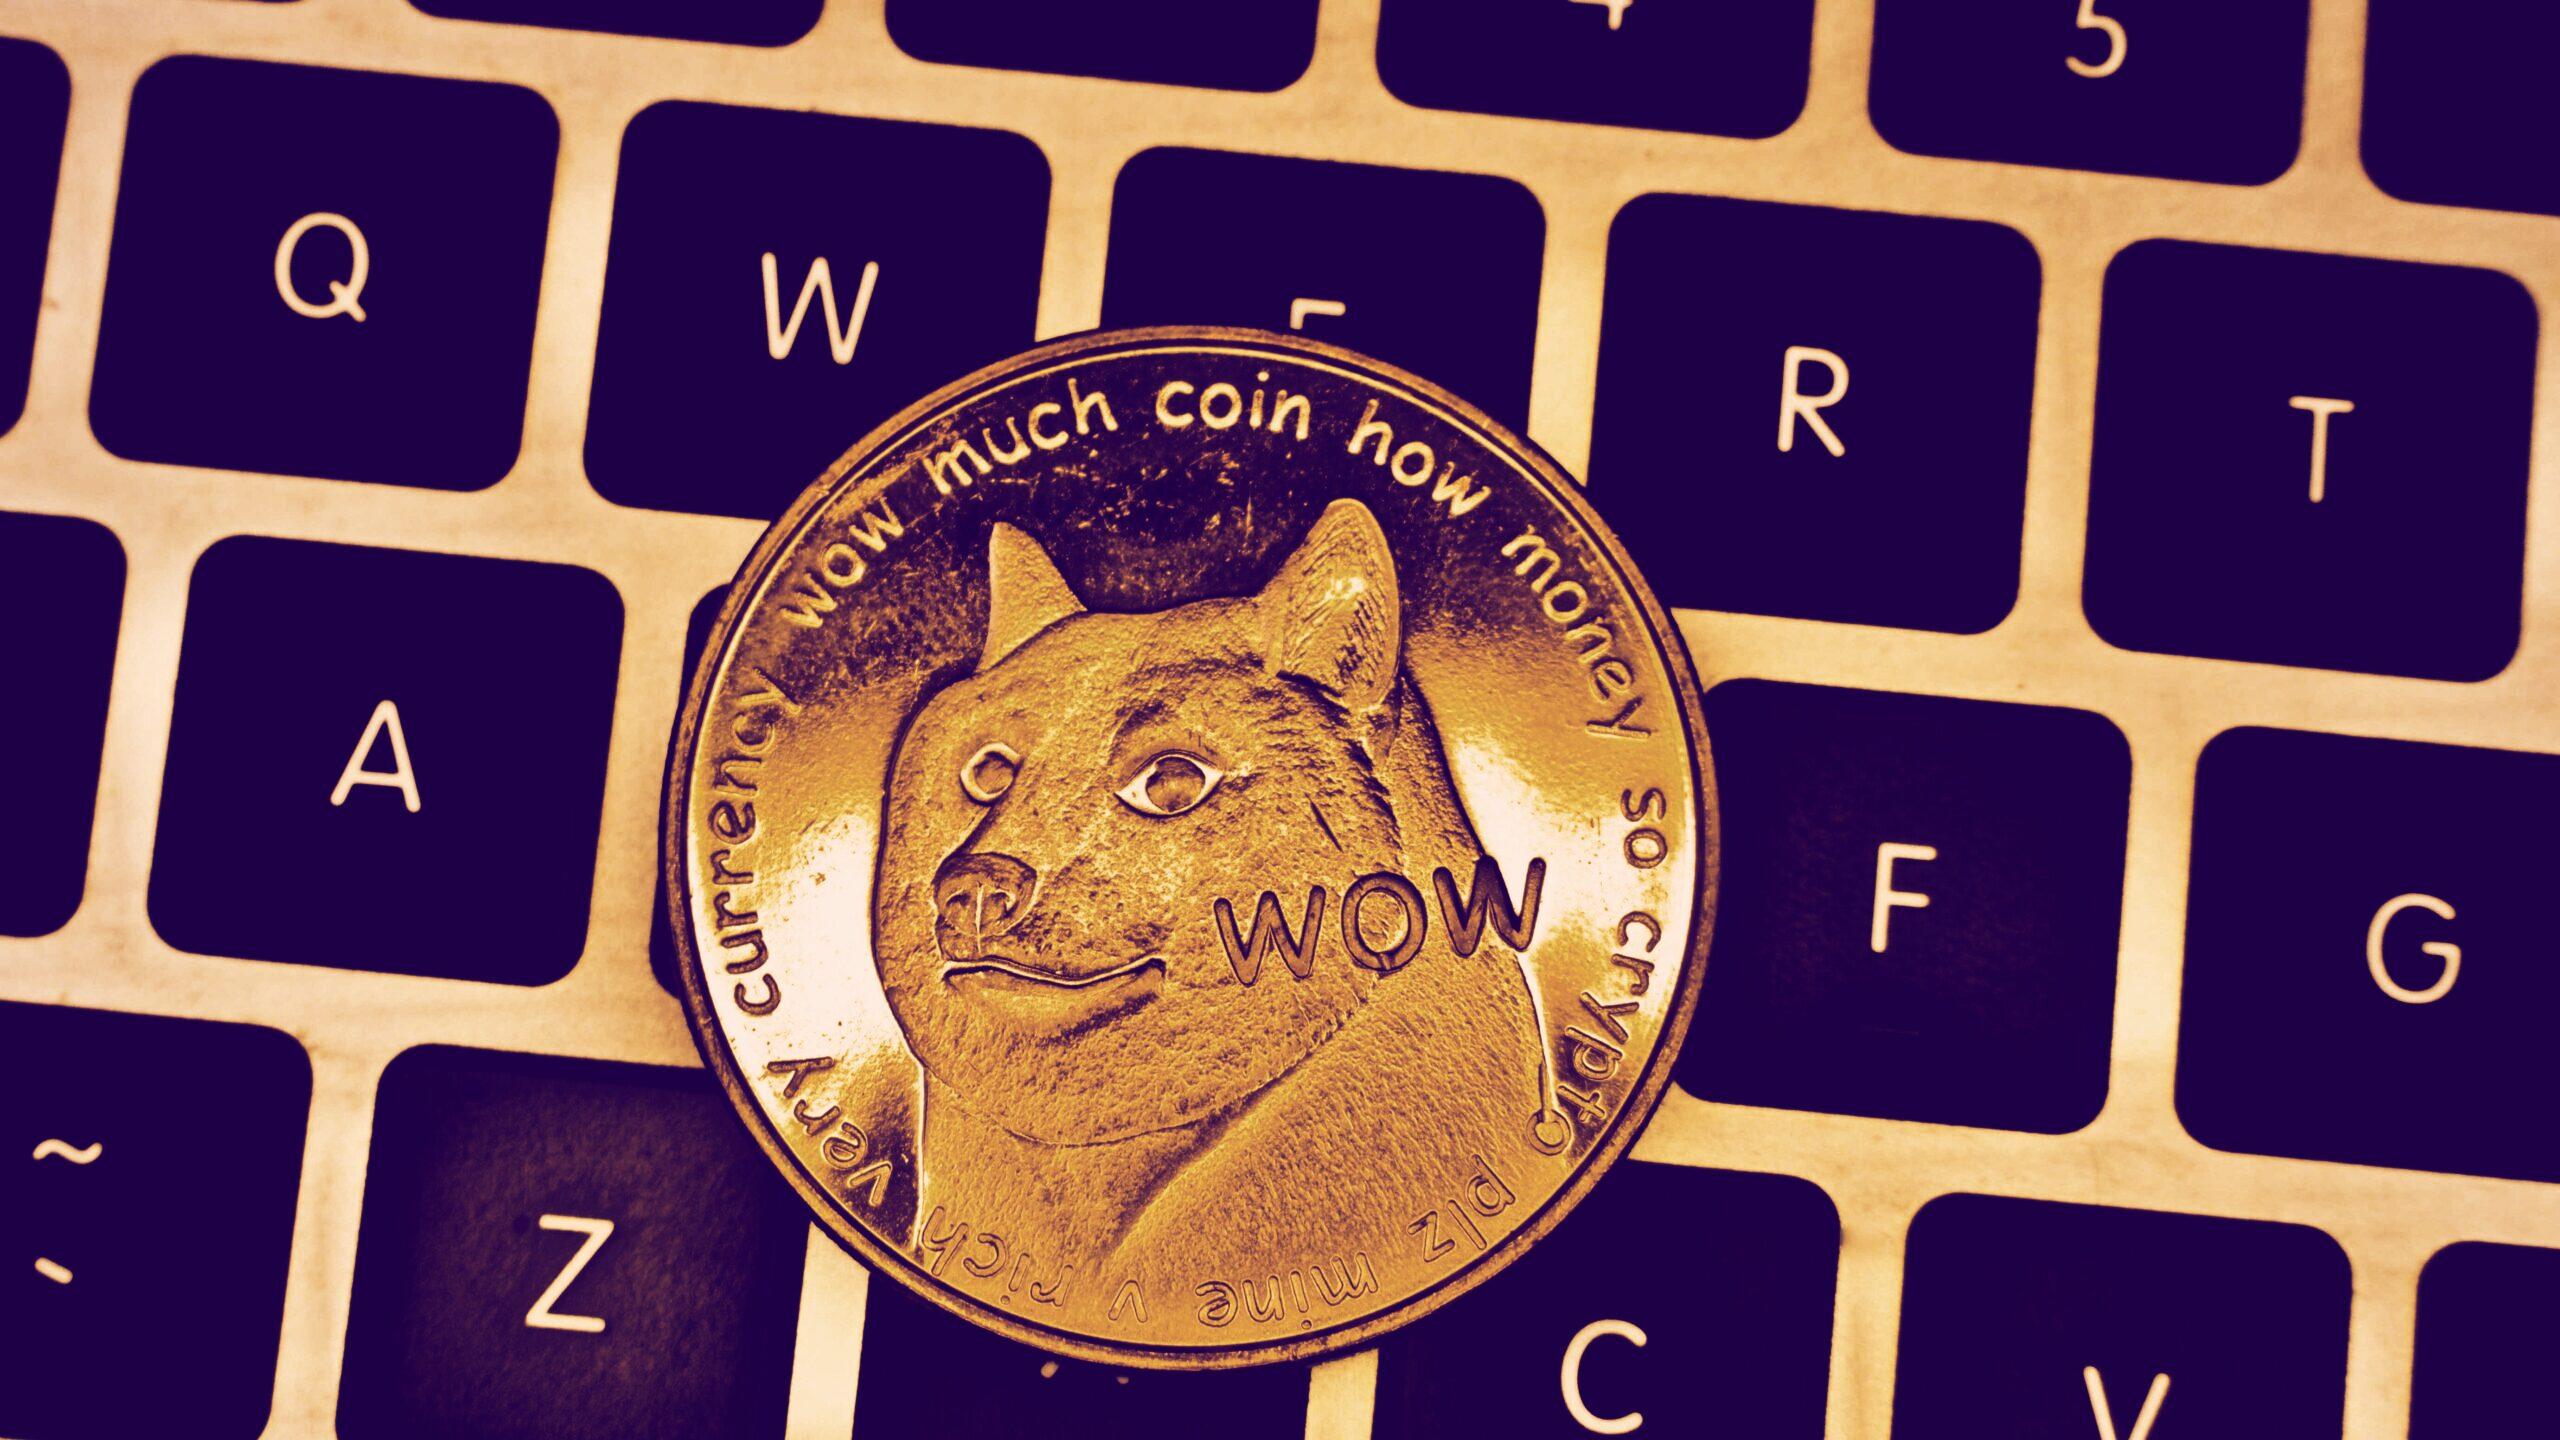 Dogecoin Devs and Elon Musk Push Fee-Reduction Proposal